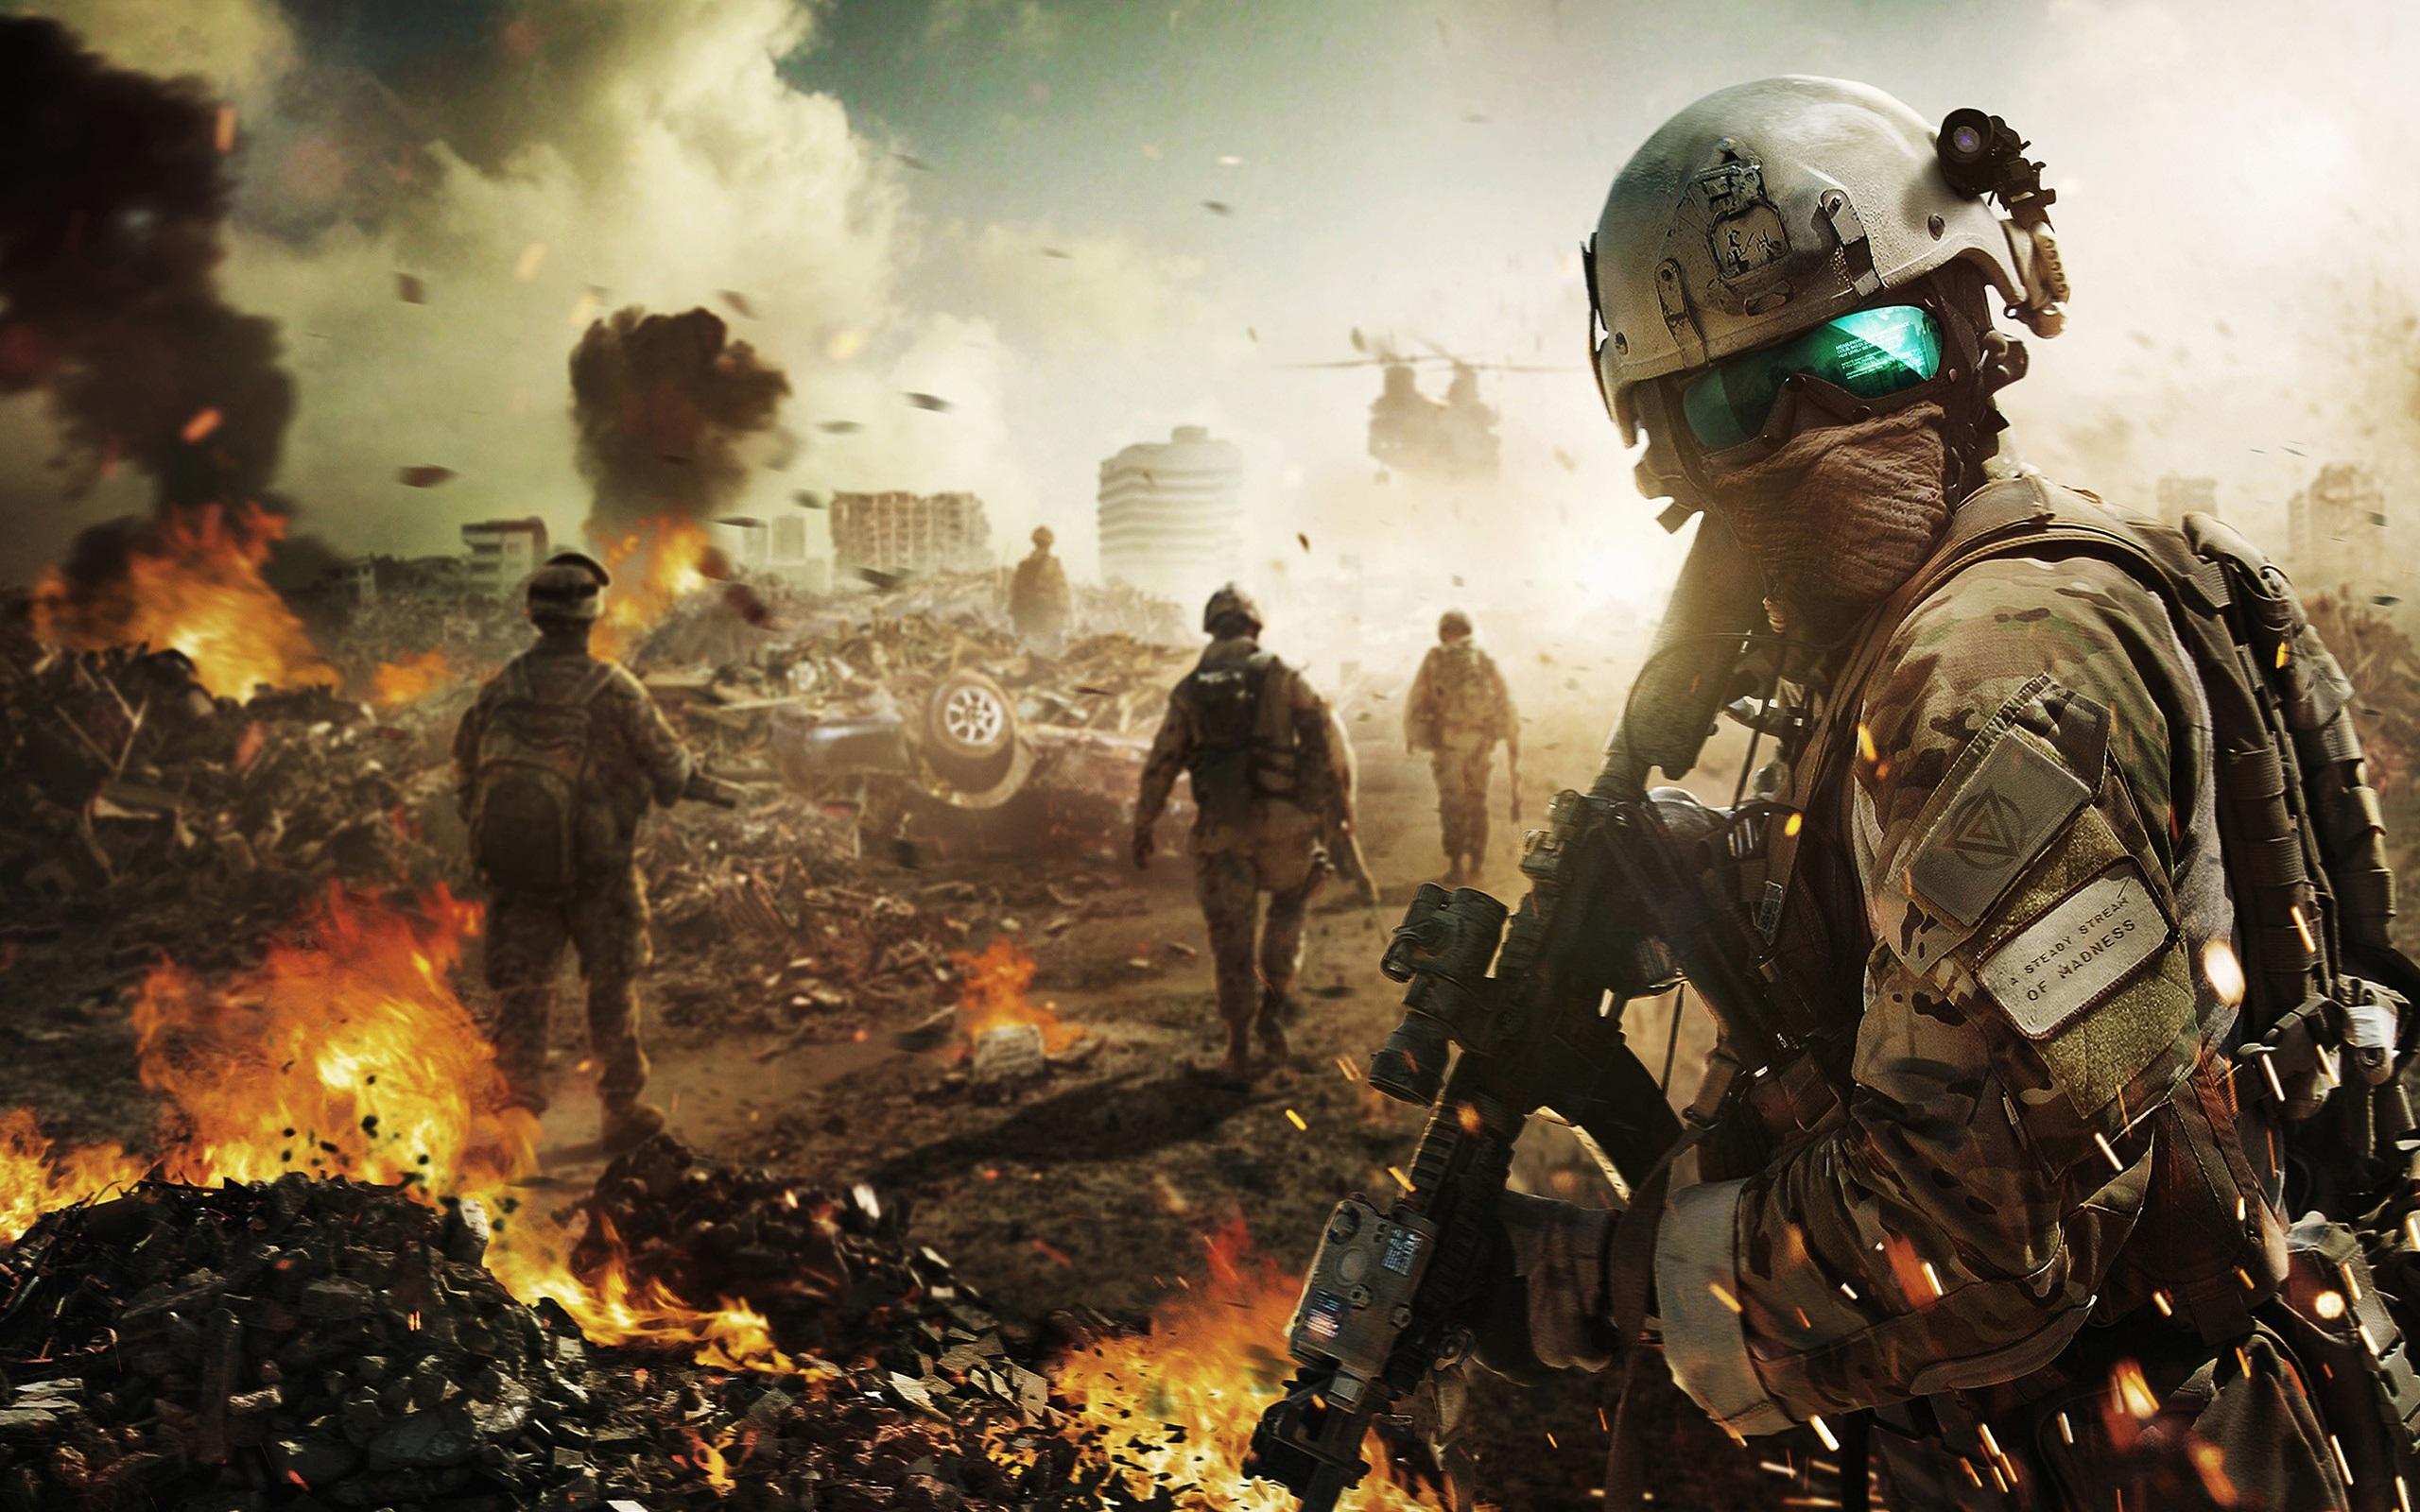 Battlefield Soldier HD desktop wallpaper,game wallpaper 4k